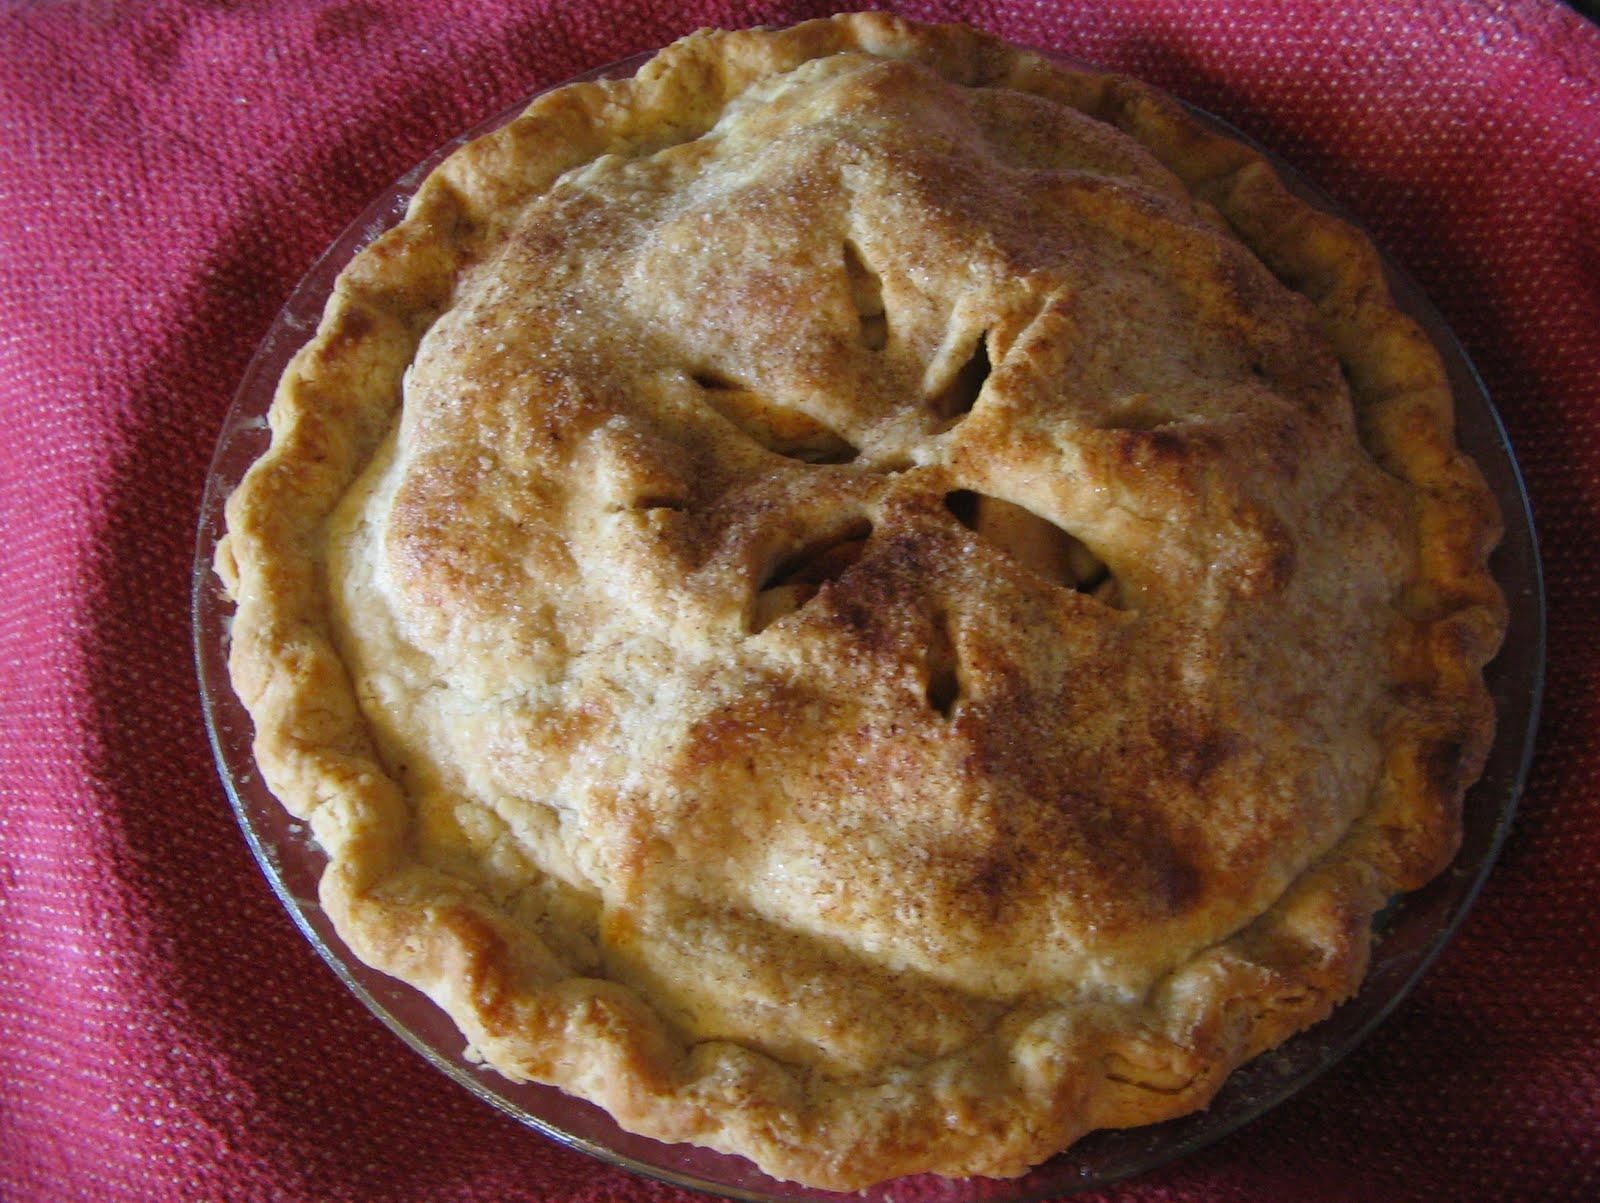 Lilac & Lavender: Perfect Pie Crust